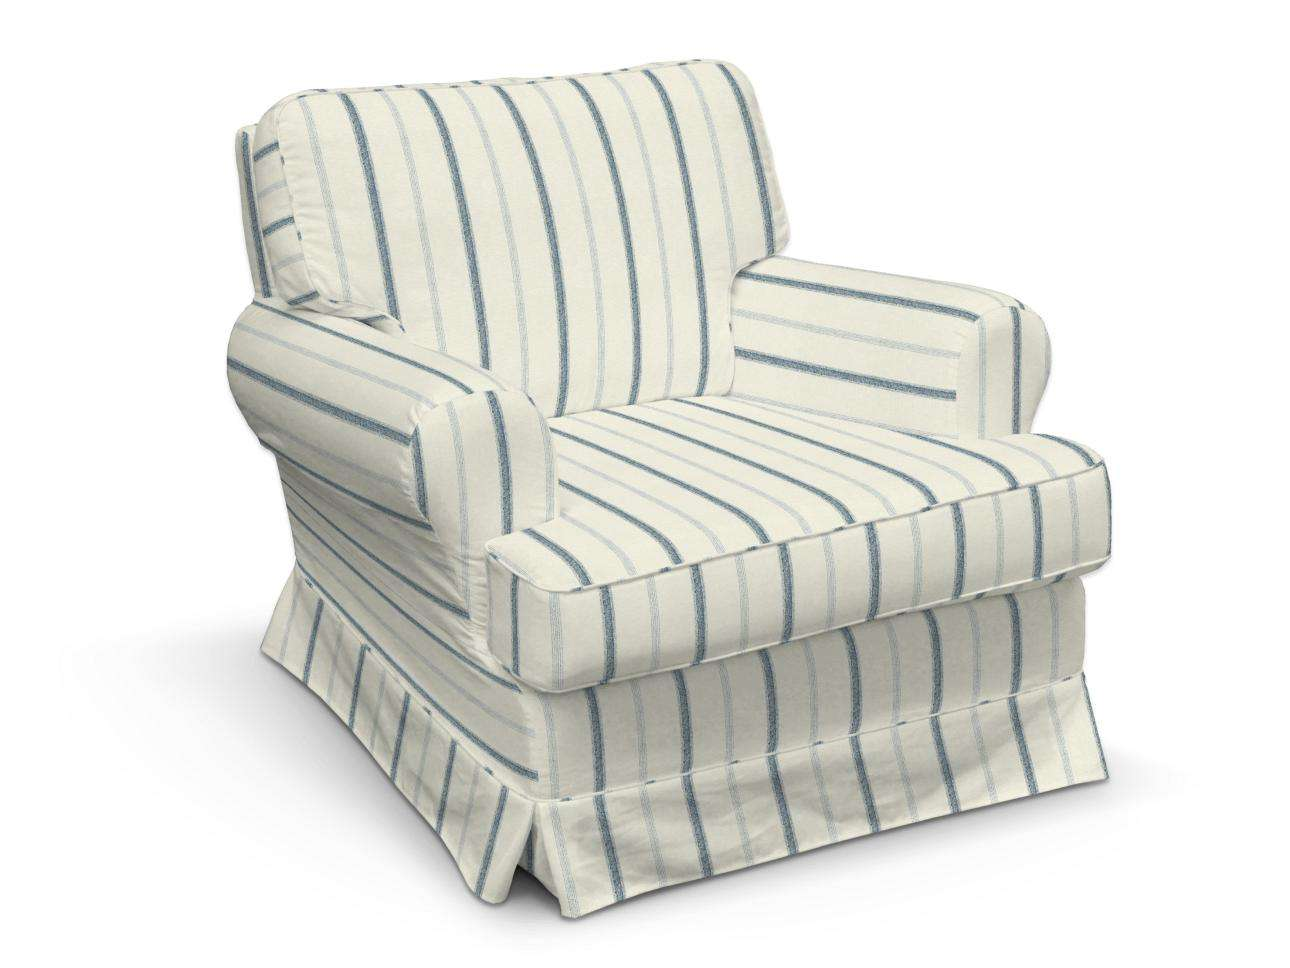 Pokrowiec na fotel Barkaby fotel Barkaby w kolekcji Avinon, tkanina: 129-66